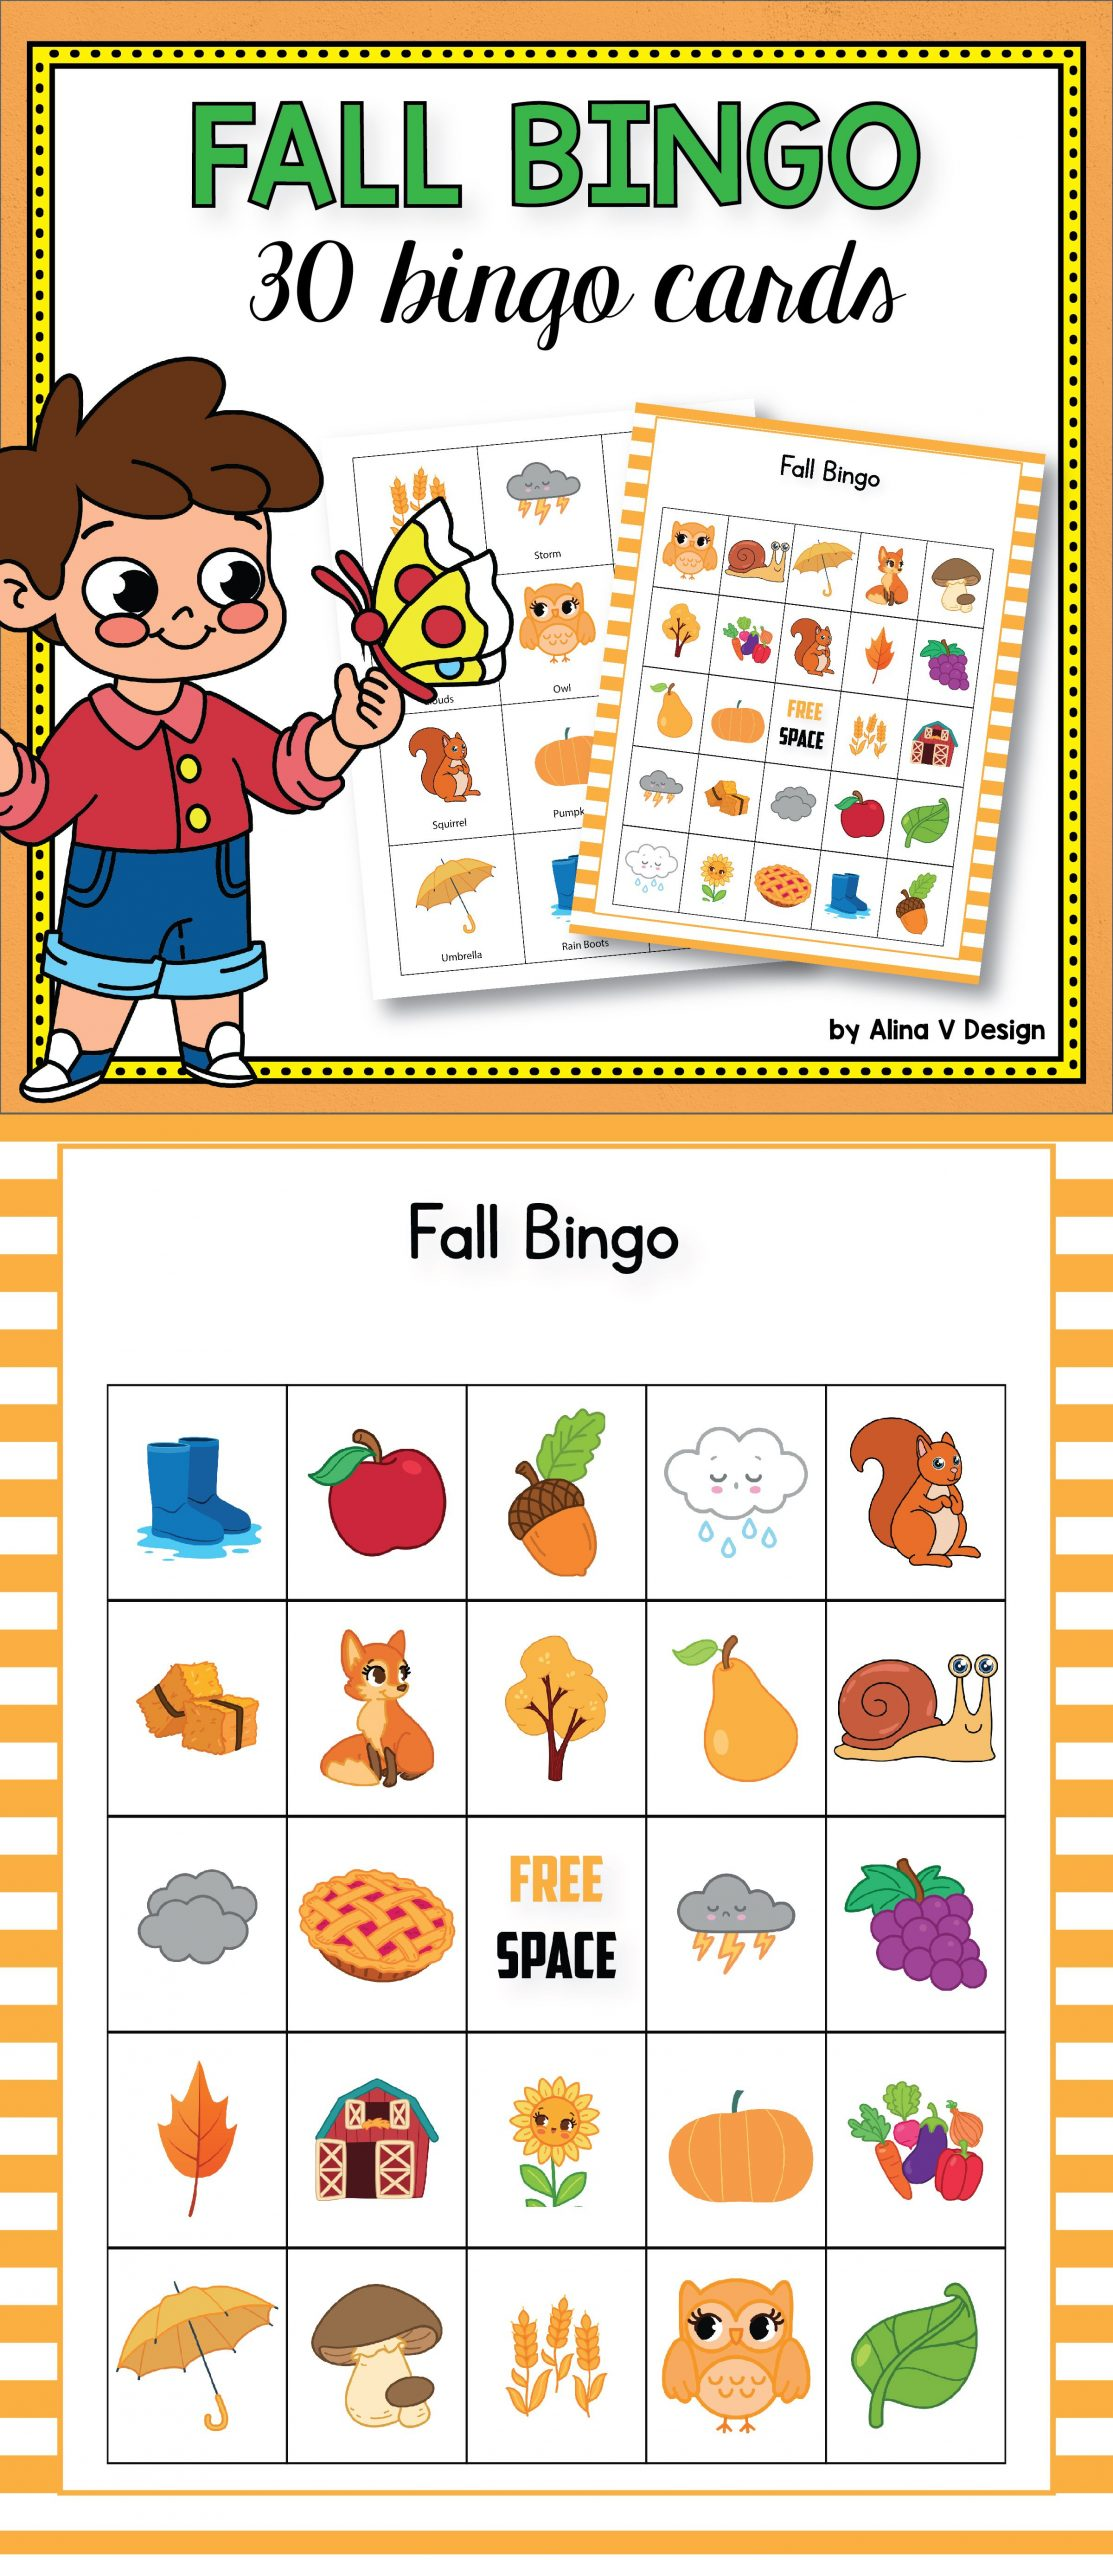 Fall Bingo Cards Preschool - Autumn Bingo, Fall Games